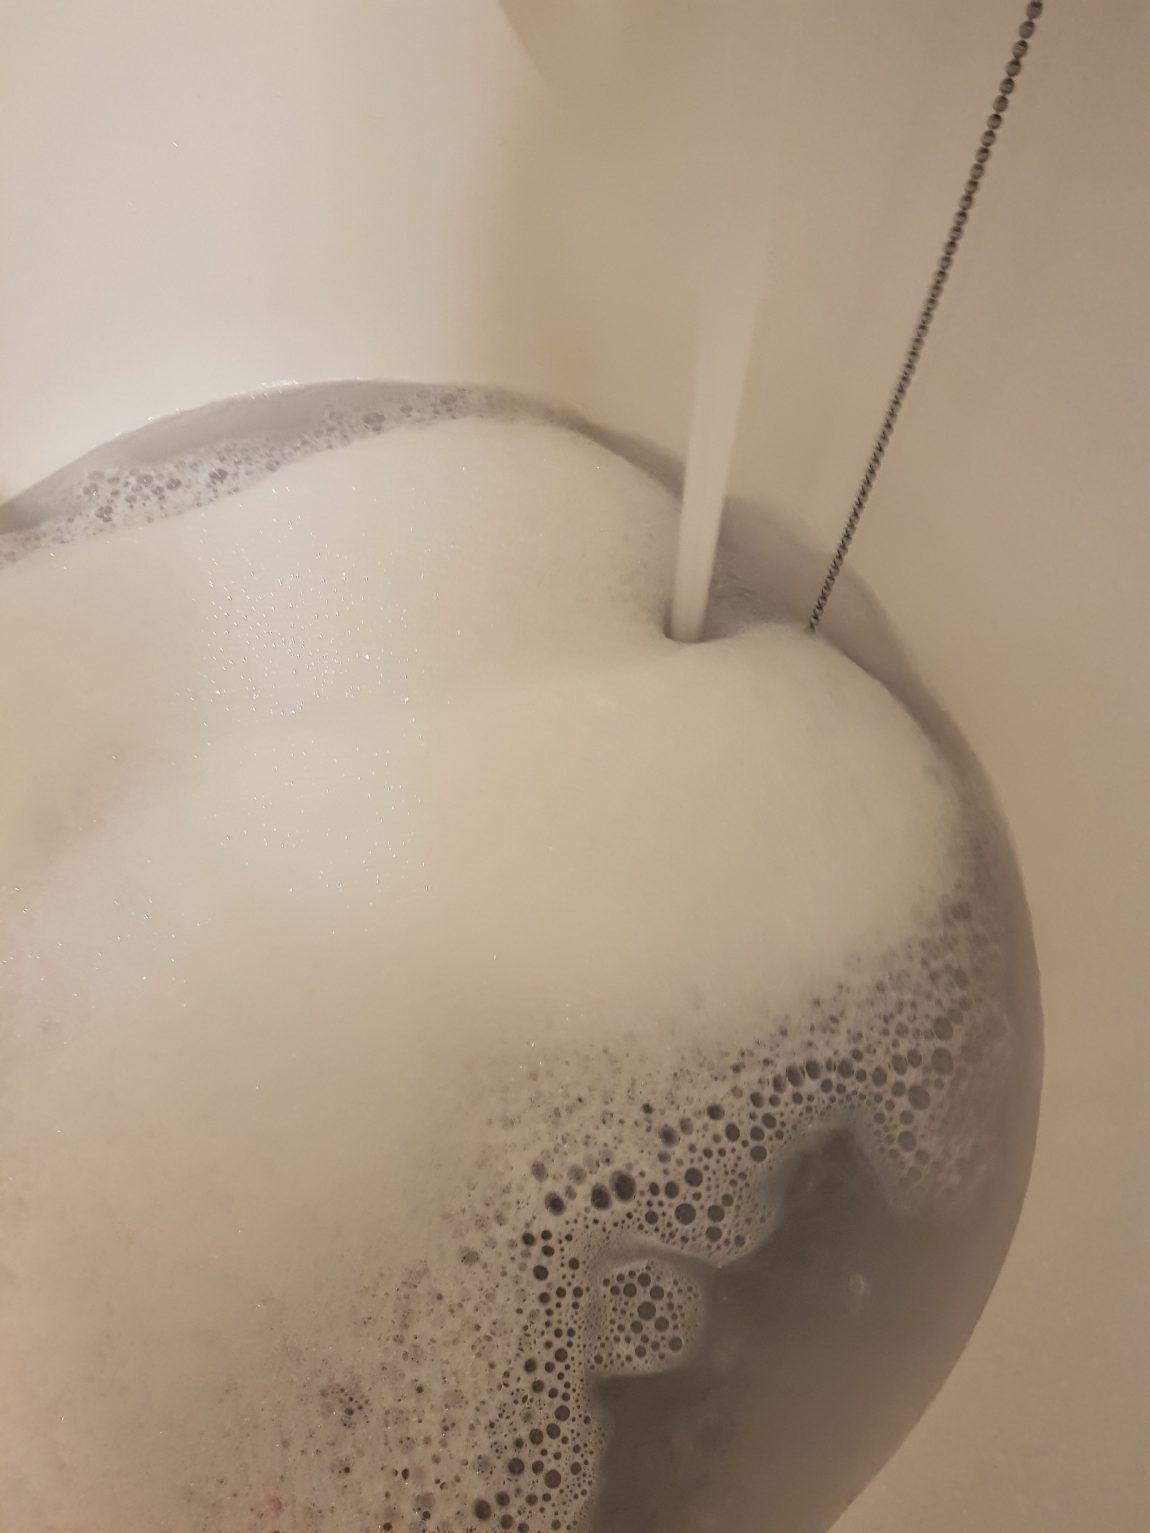 running bath water